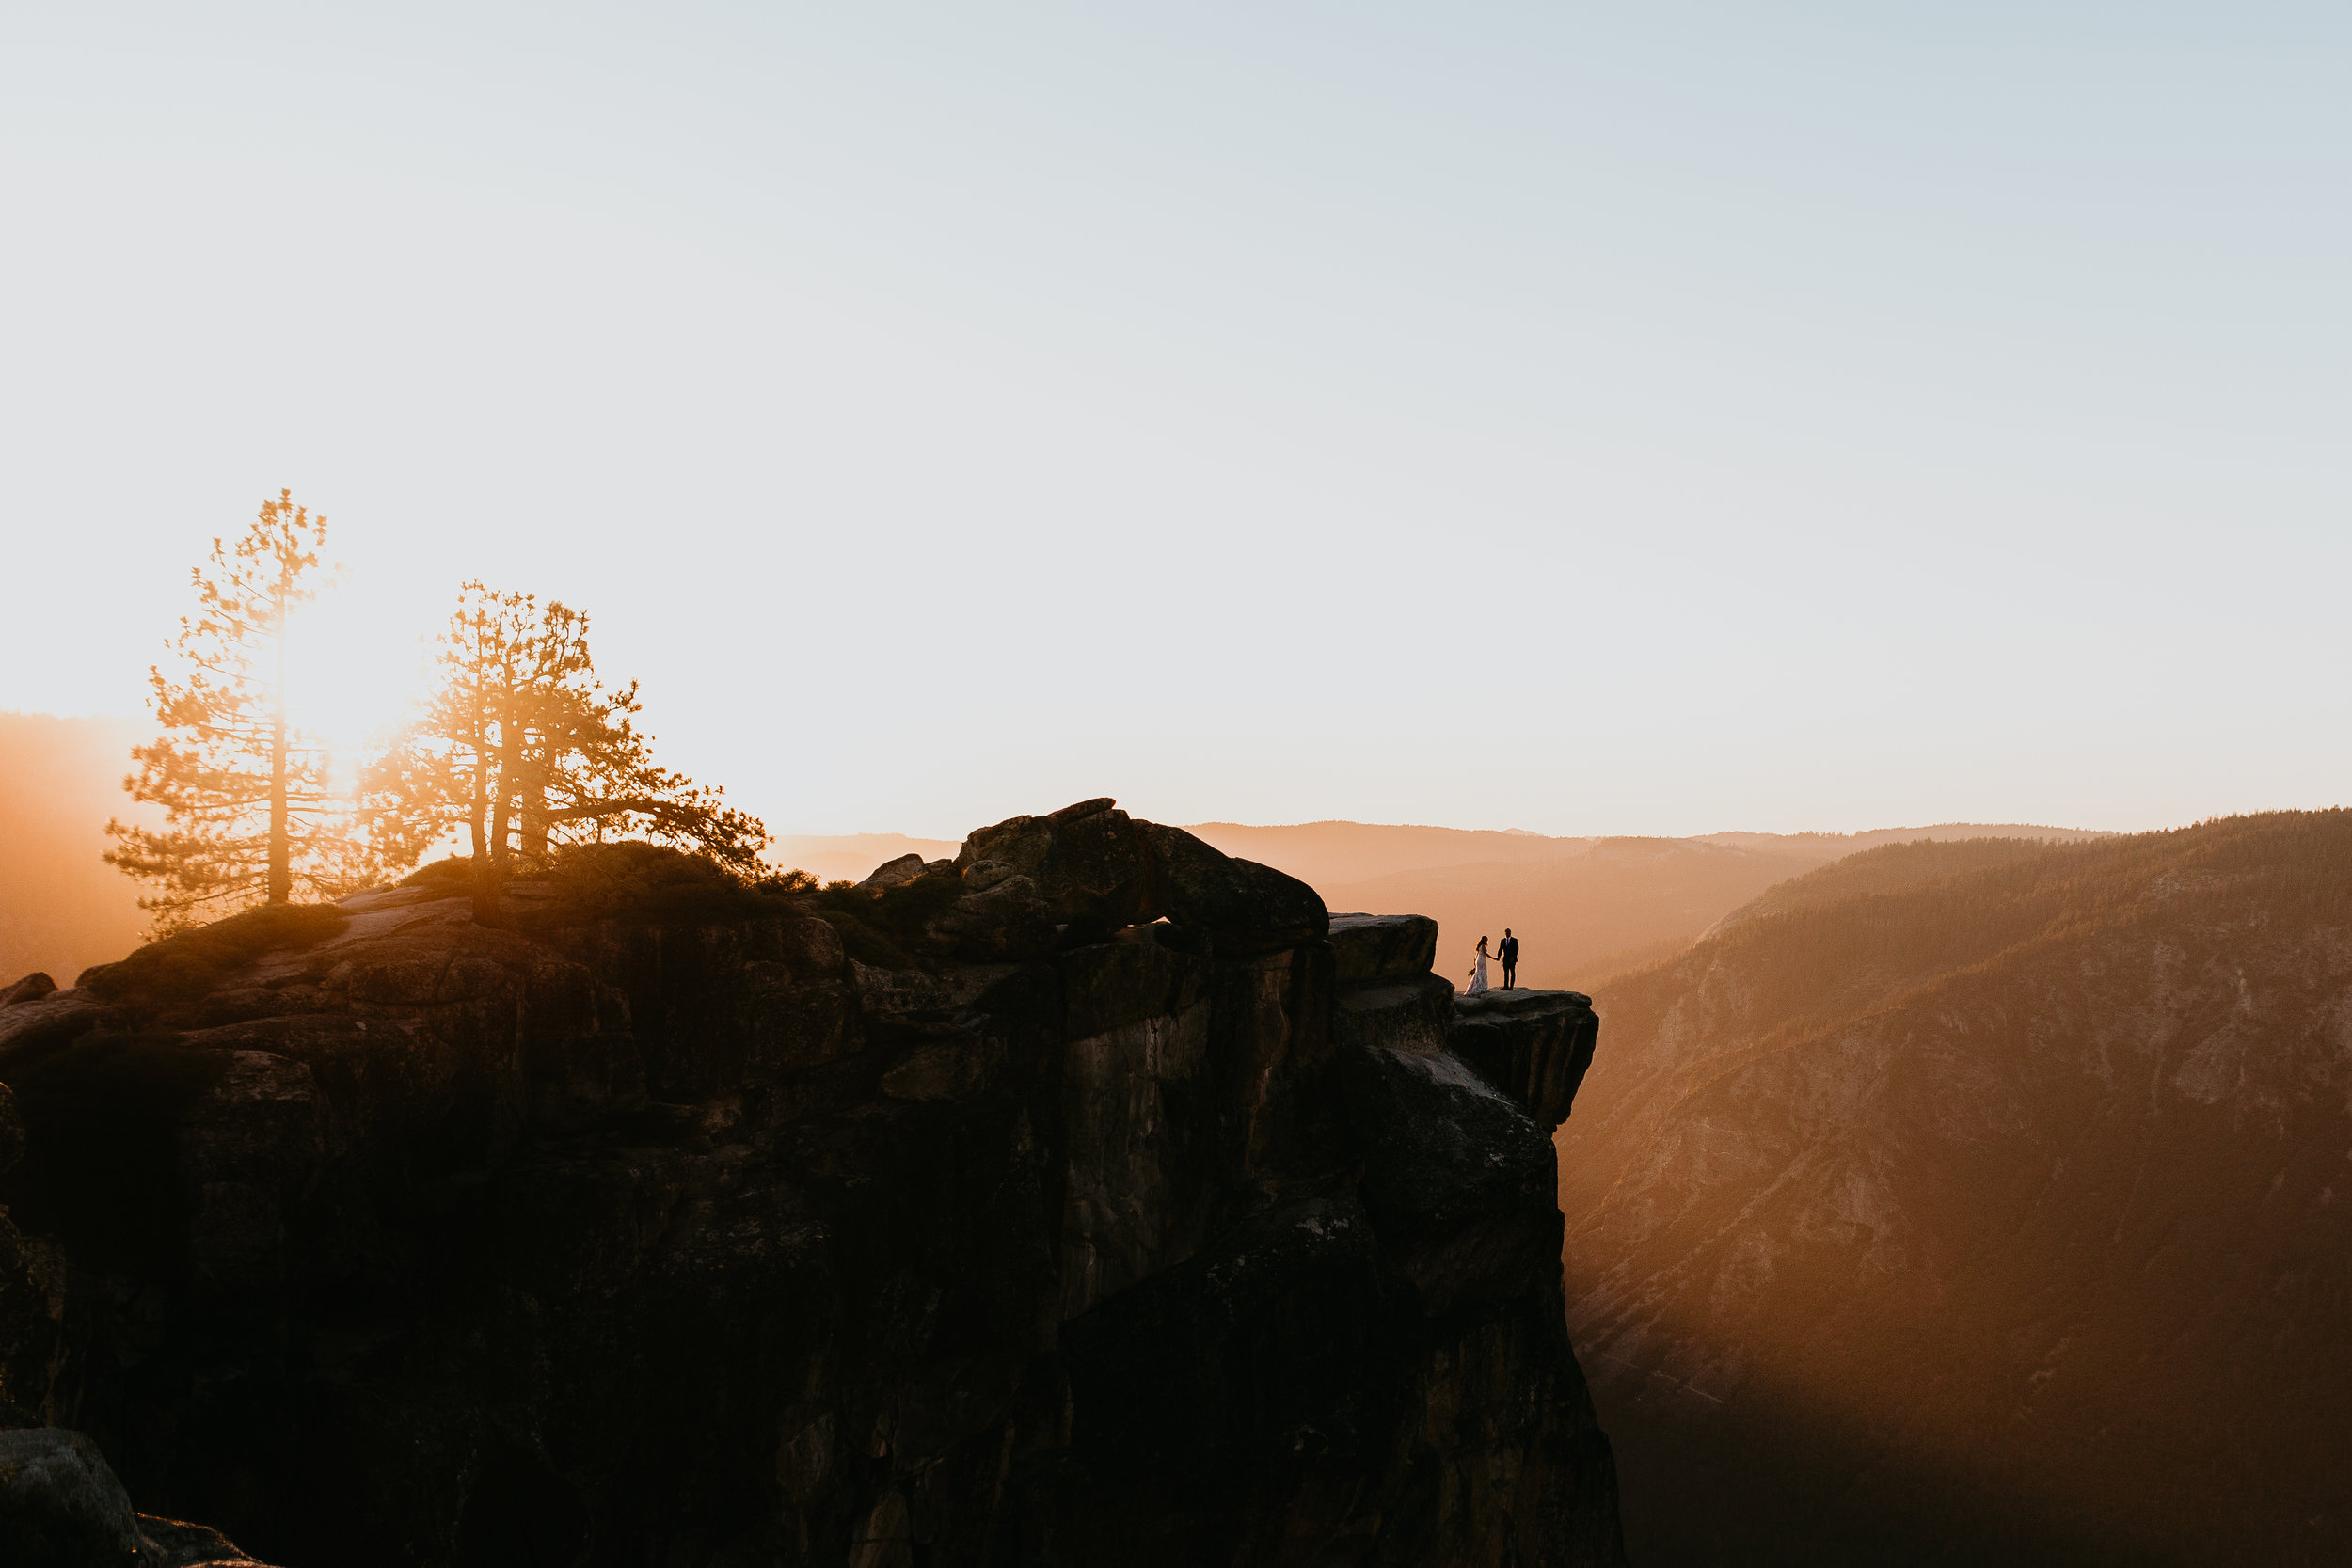 nicole-daacke-photography-yosemite-national-park-elopement-at-taft-point-tunnel-view-yosemite-intimate-wedding-fall-sunset-adventure-elopement-photographer-76.jpg